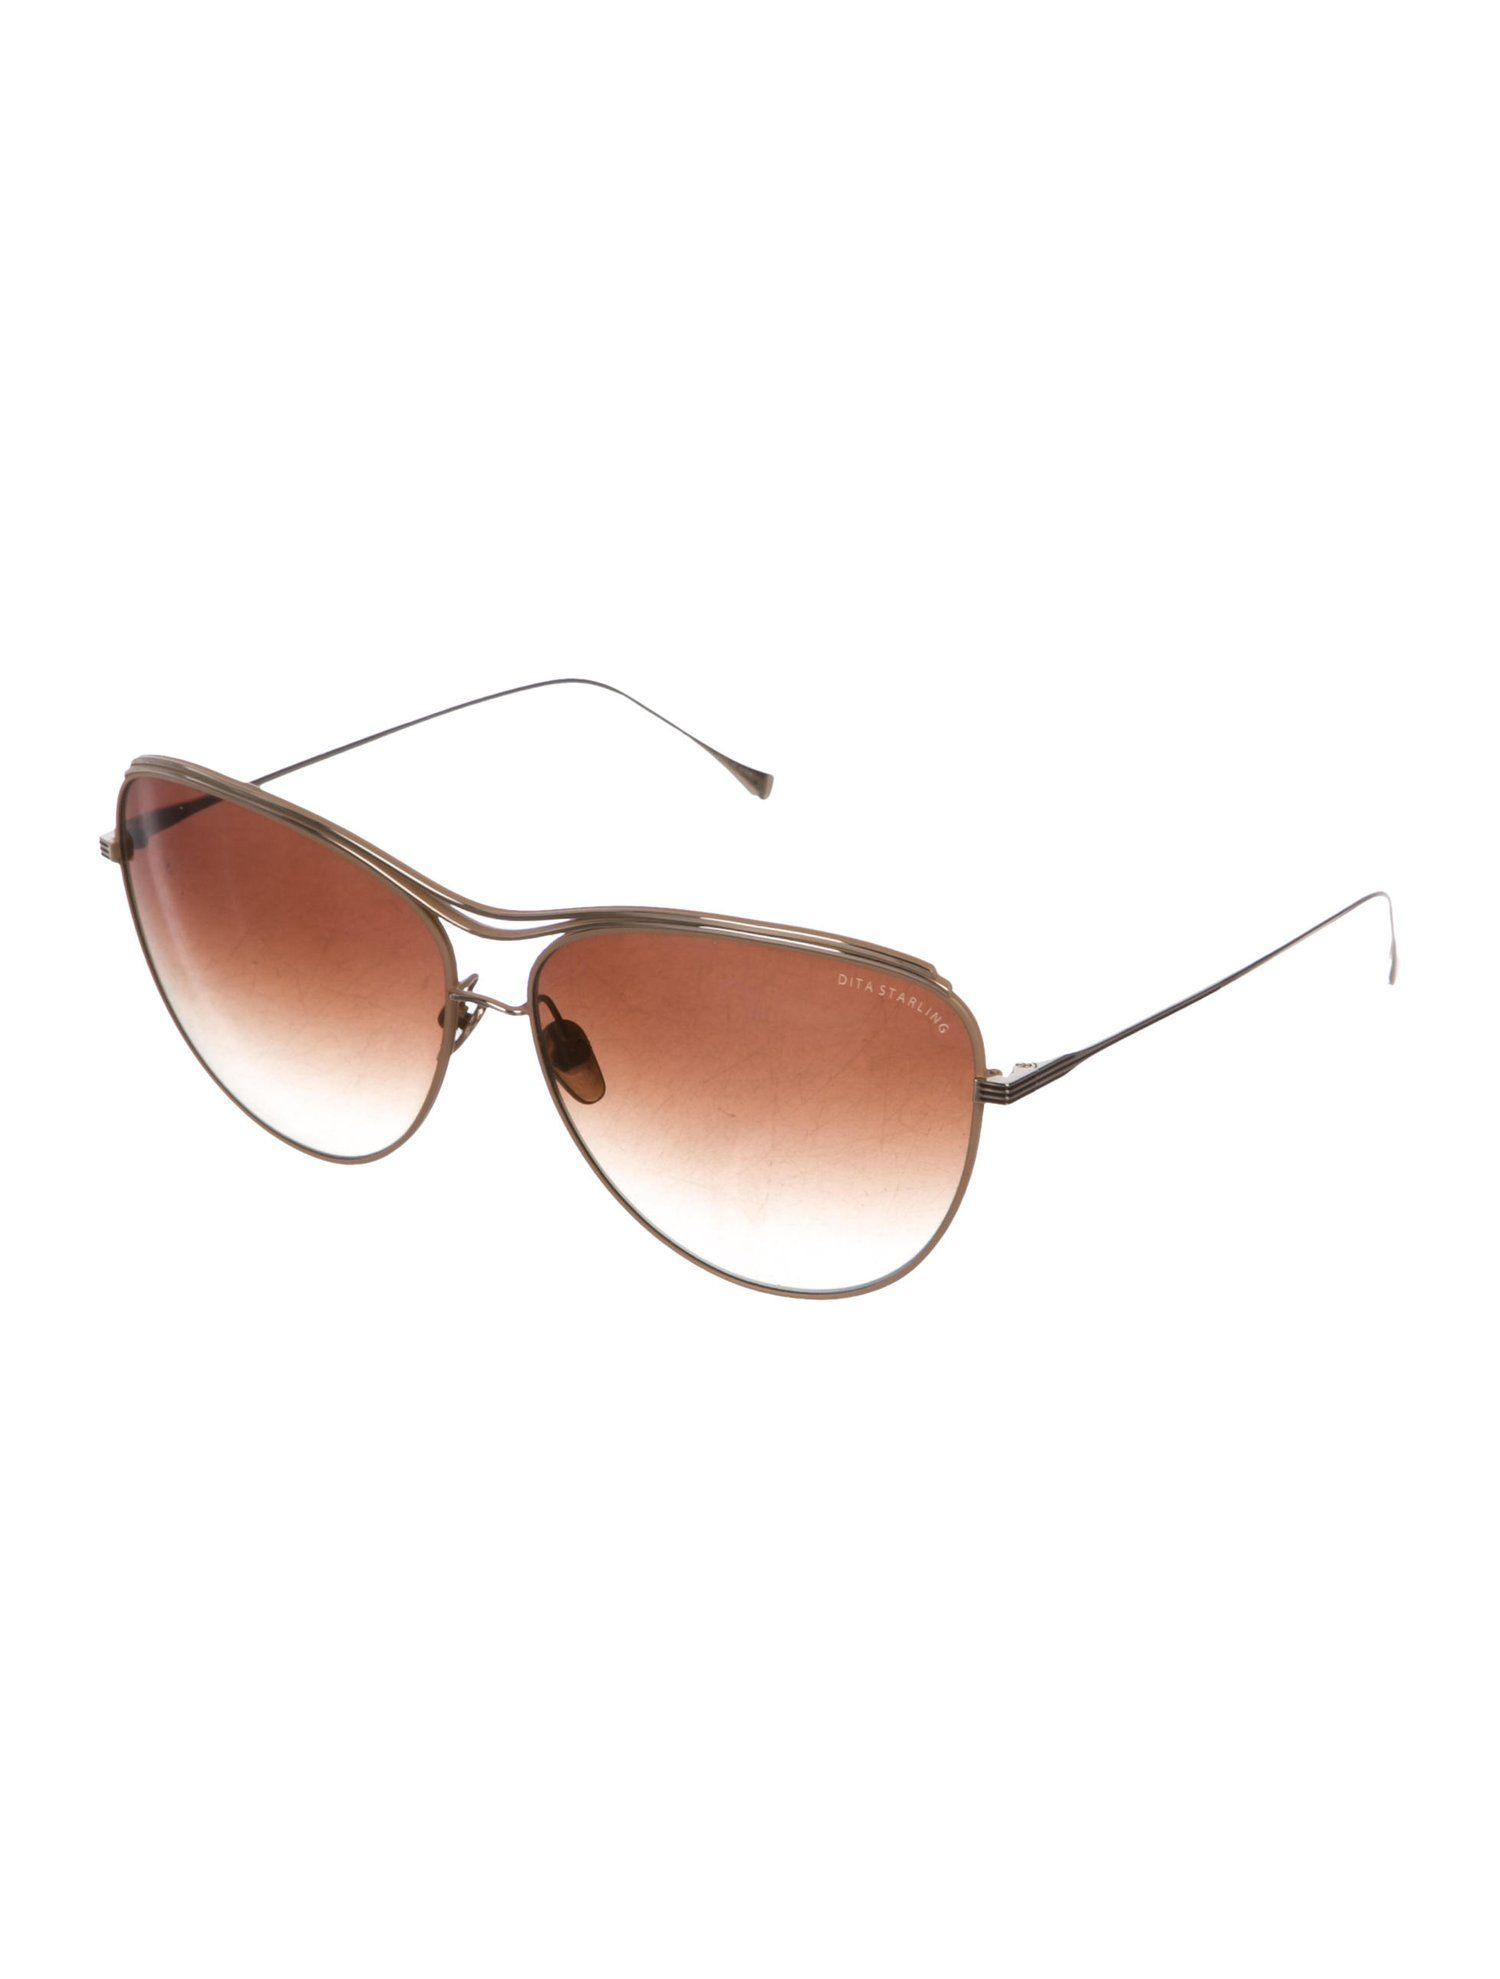 5c7d7c5fba0 Dita Aviator Gradient Sunglasses  Aviator  Dita  Sunglasses